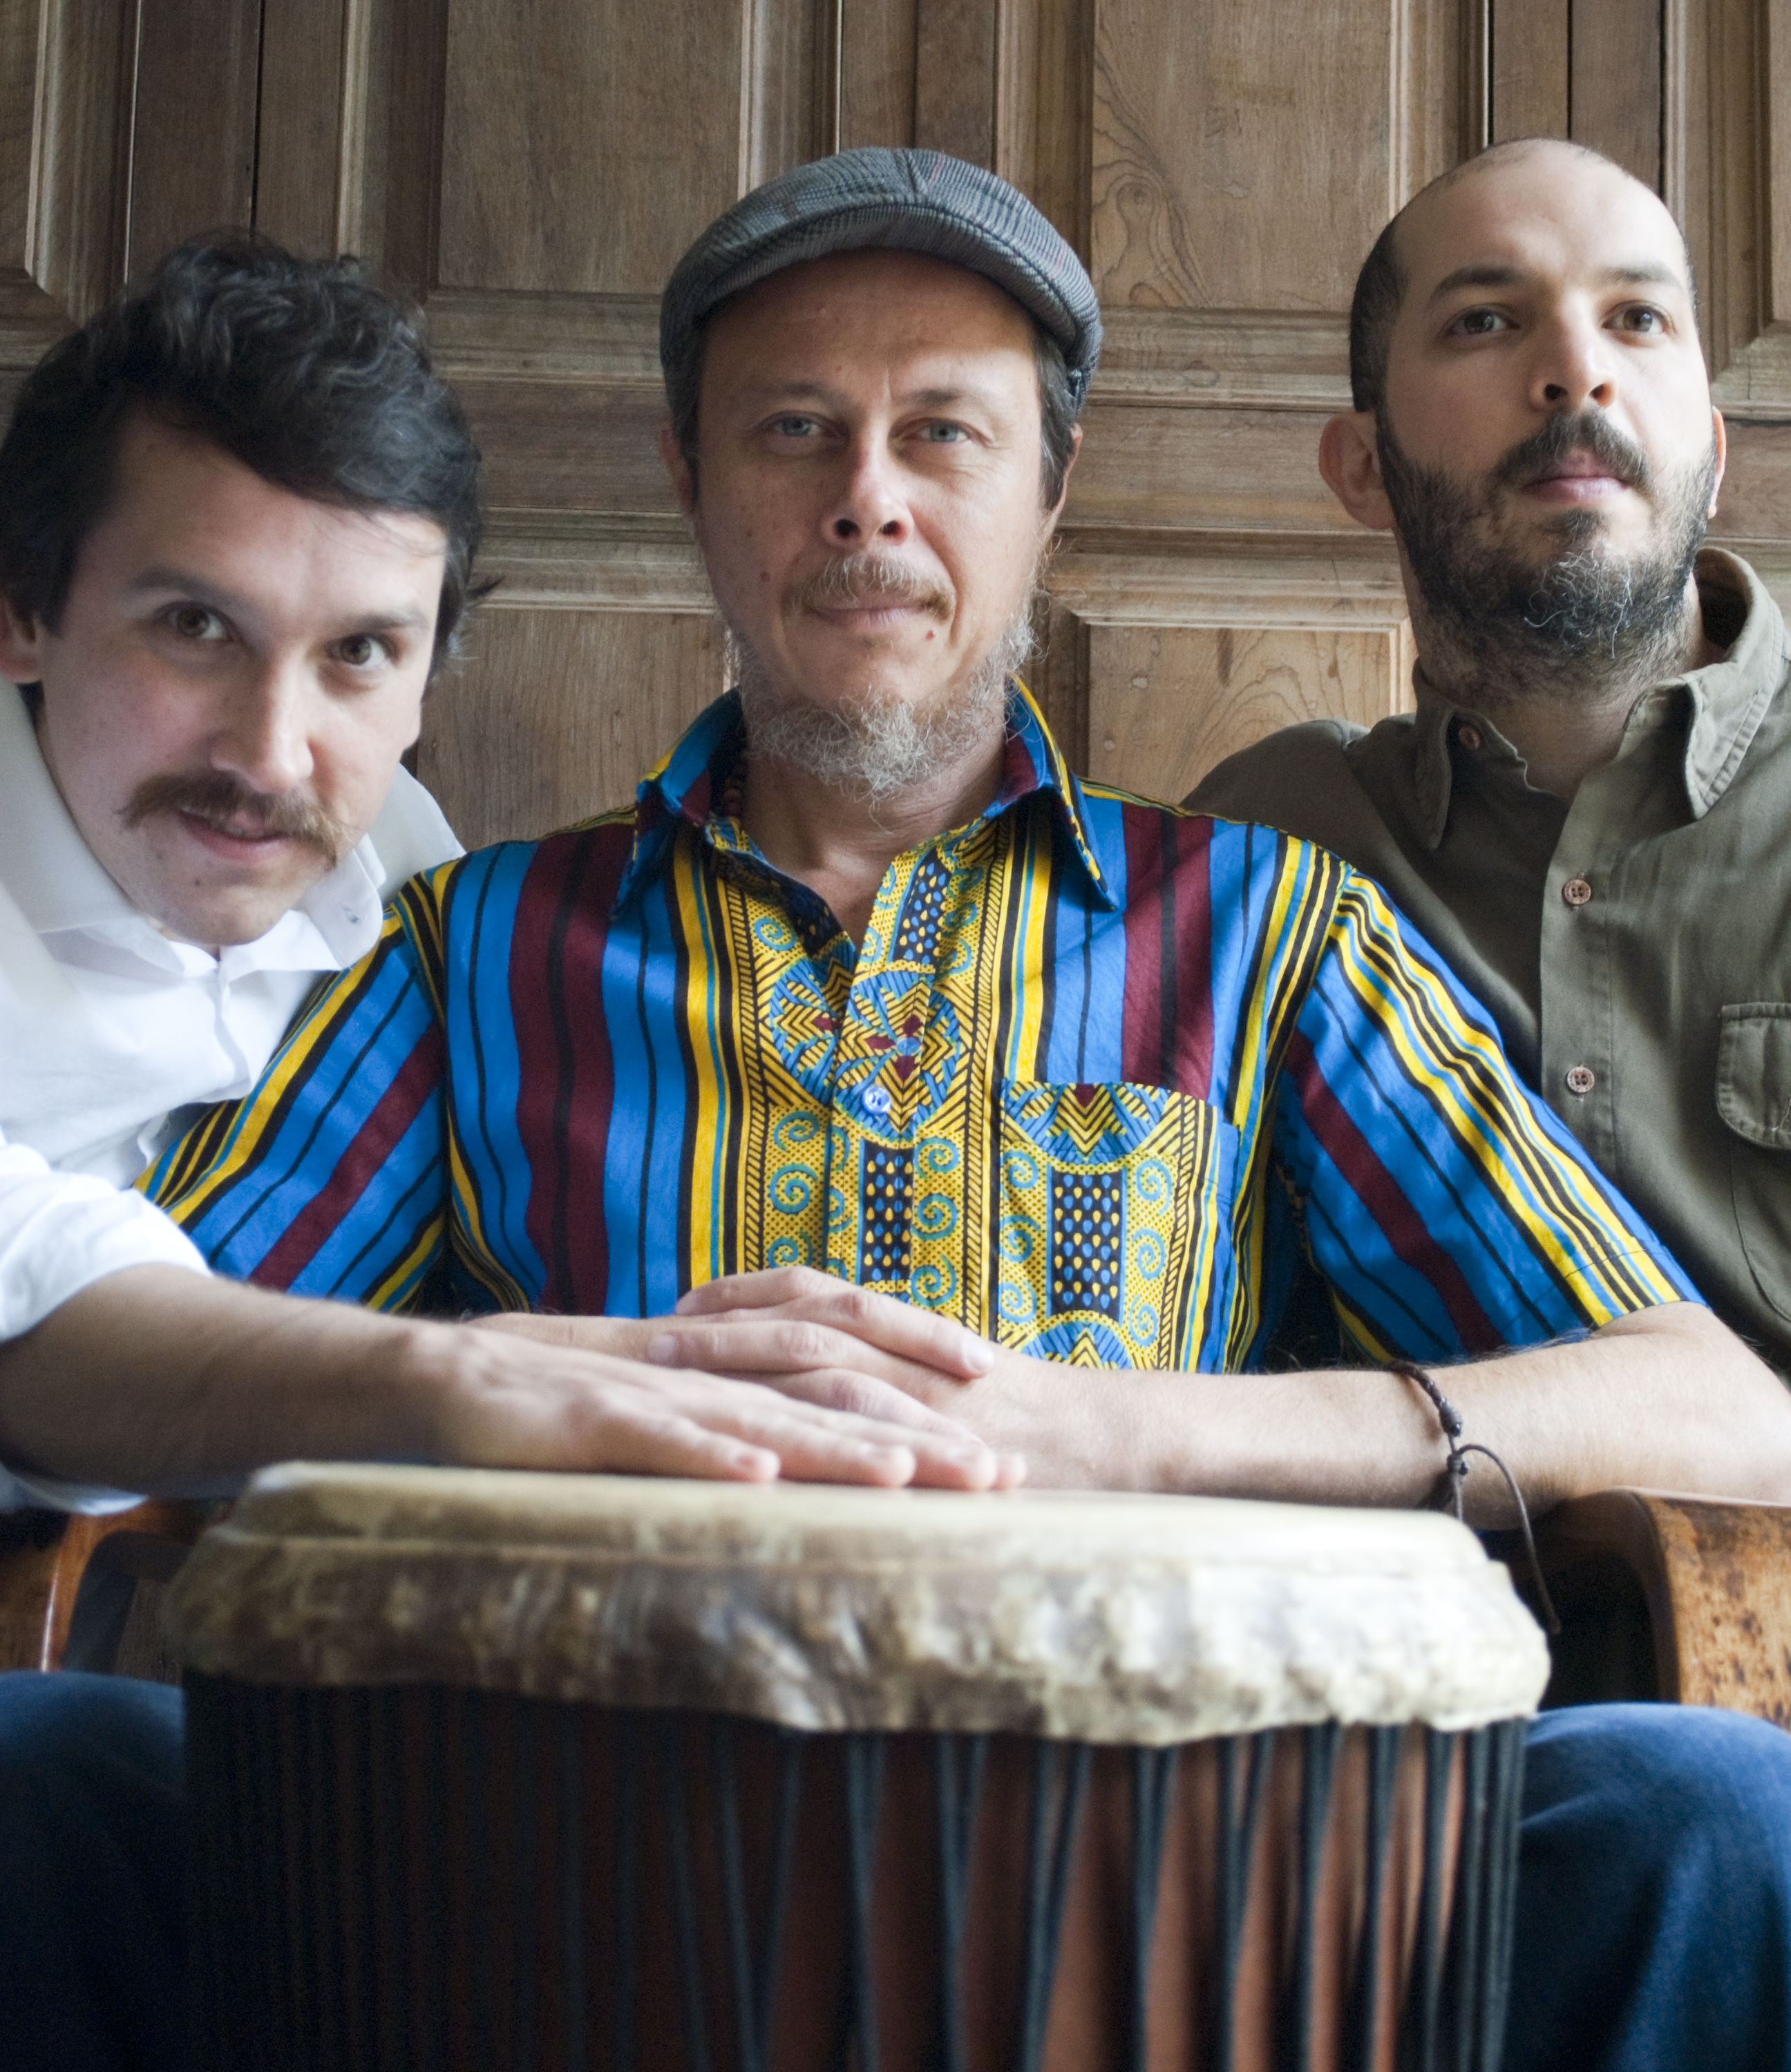 Thiago, Julio, Guilherme